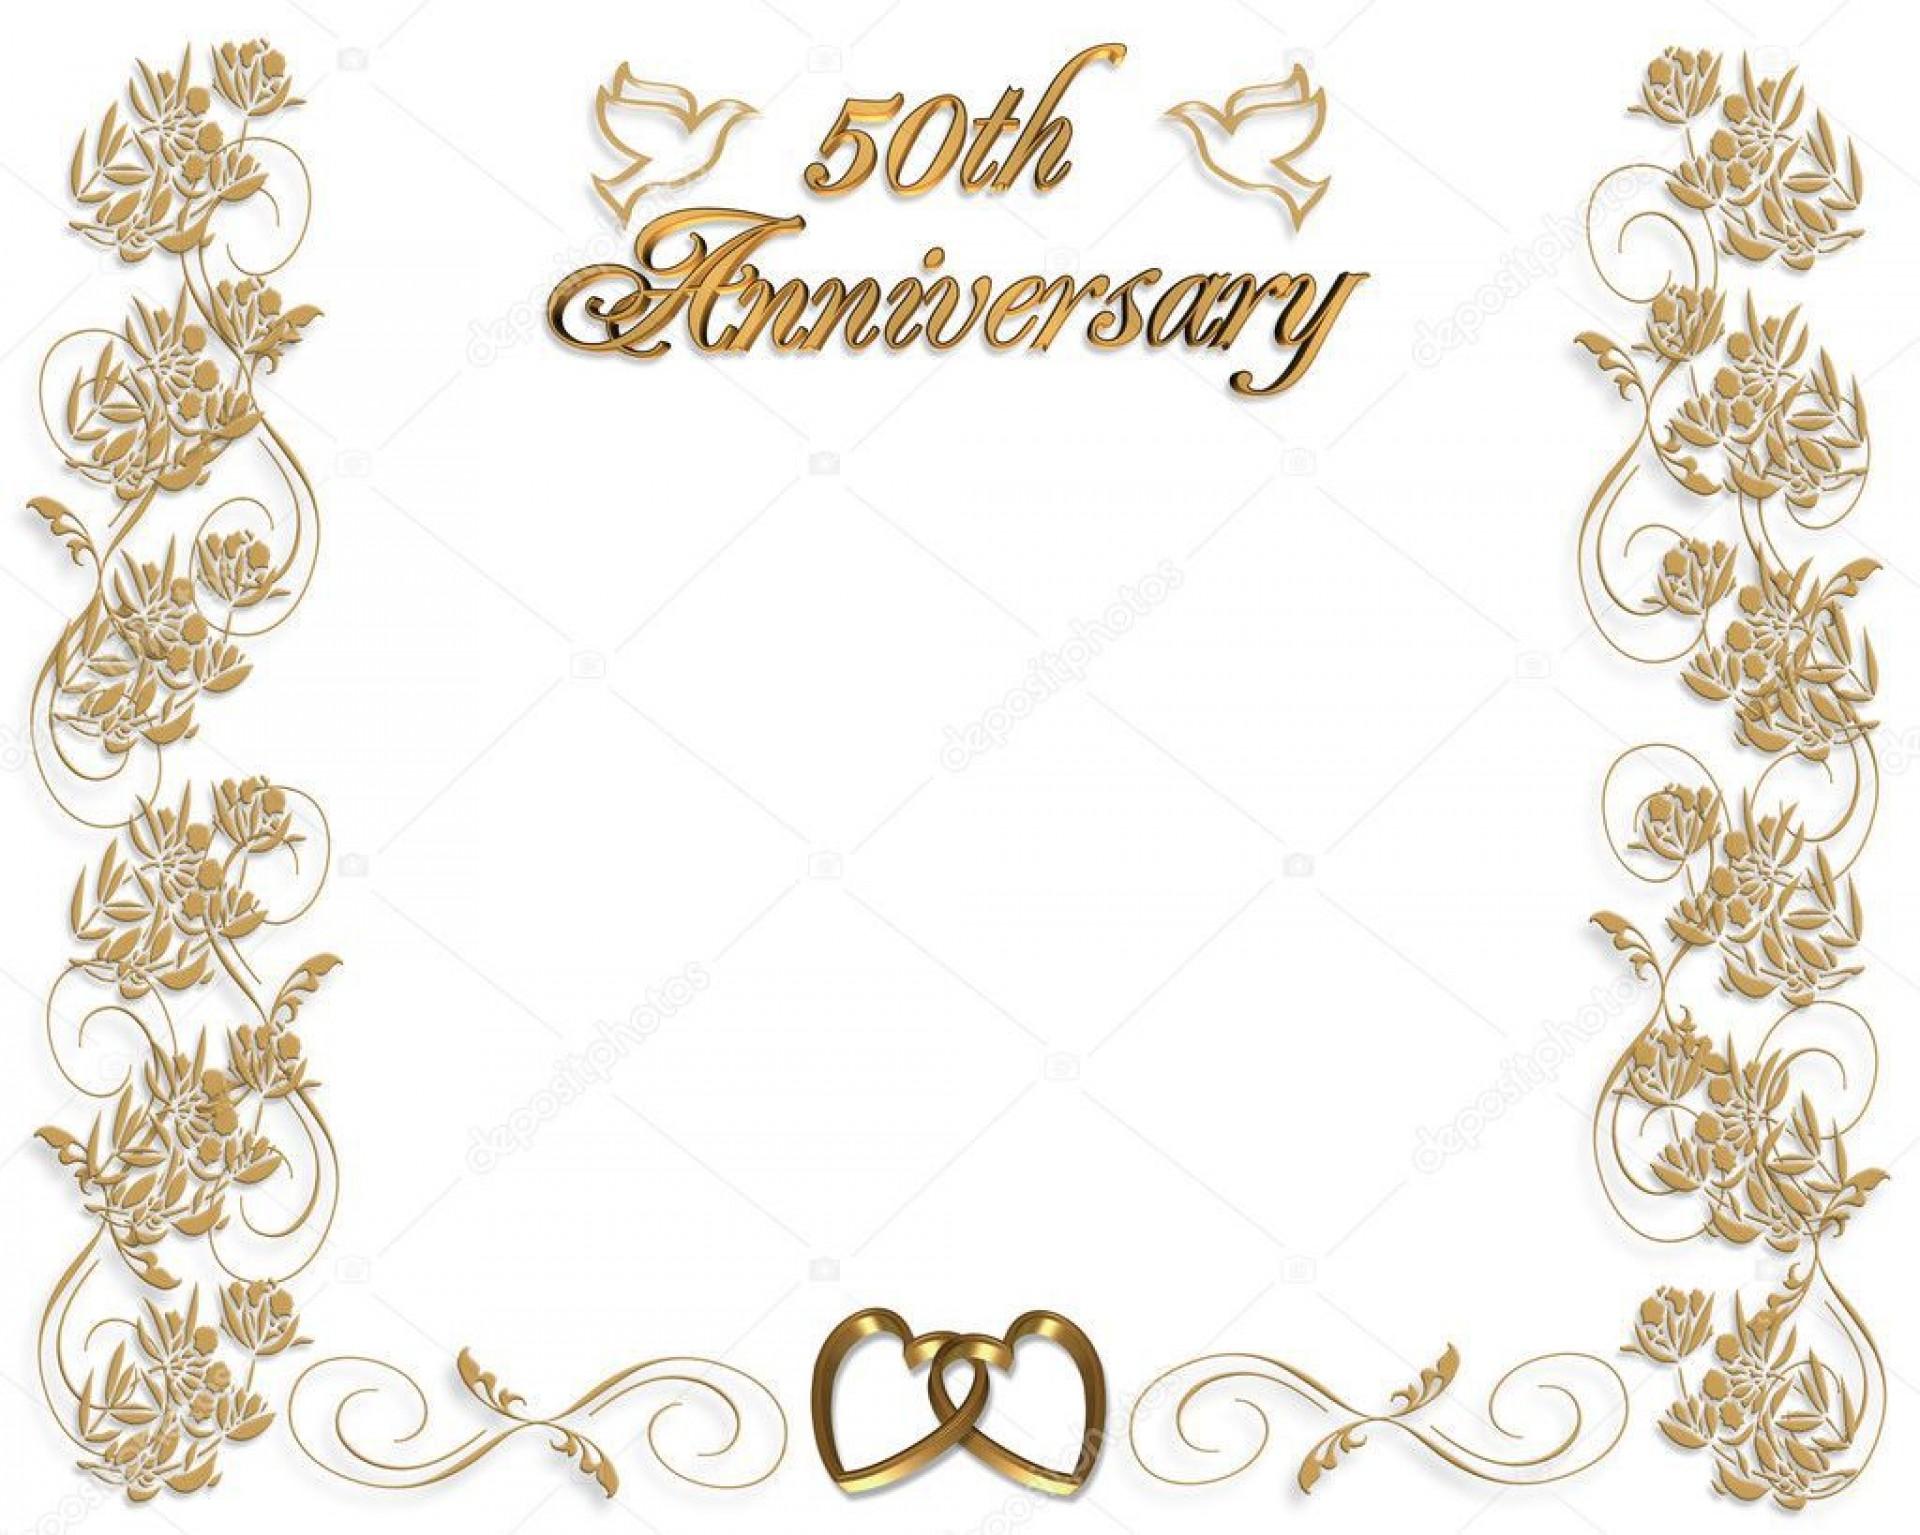 009 Breathtaking 50th Anniversary Invitation Design Highest Clarity  Designs Wedding Template Microsoft Word Surprise Party Wording Card Idea1920